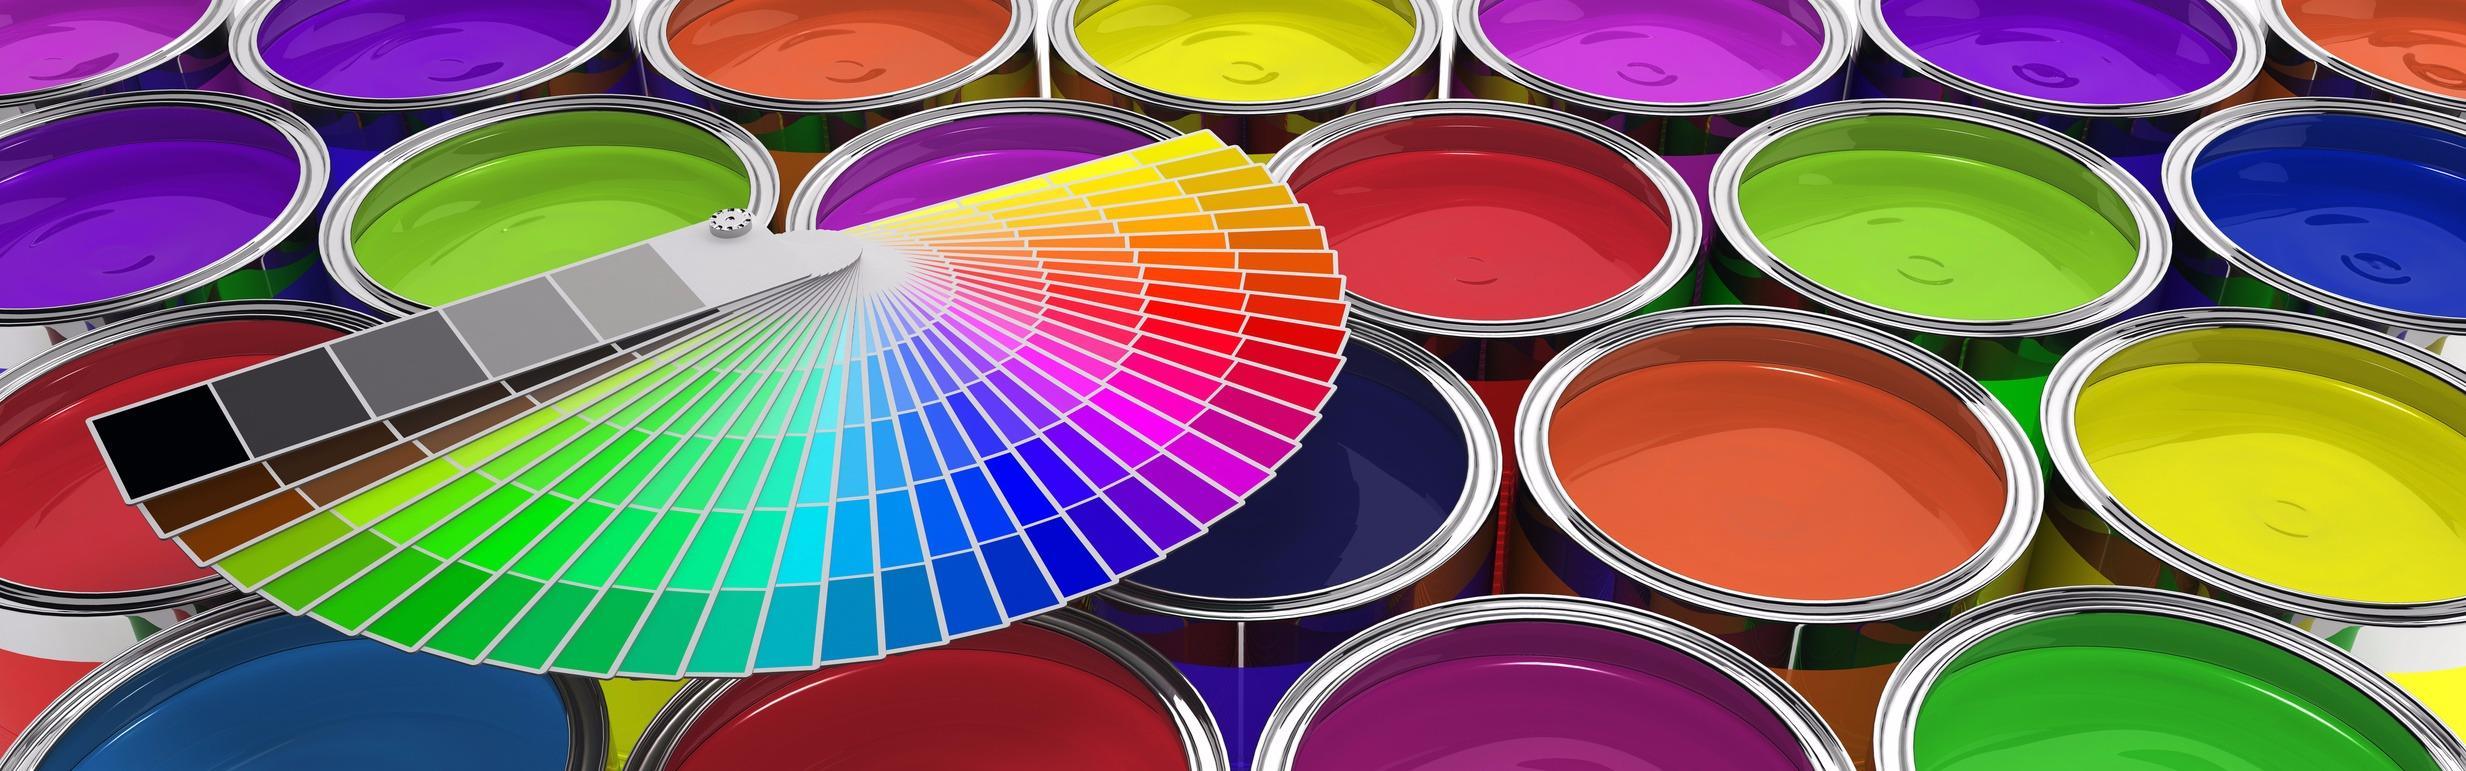 Gowans Printing Company image 12